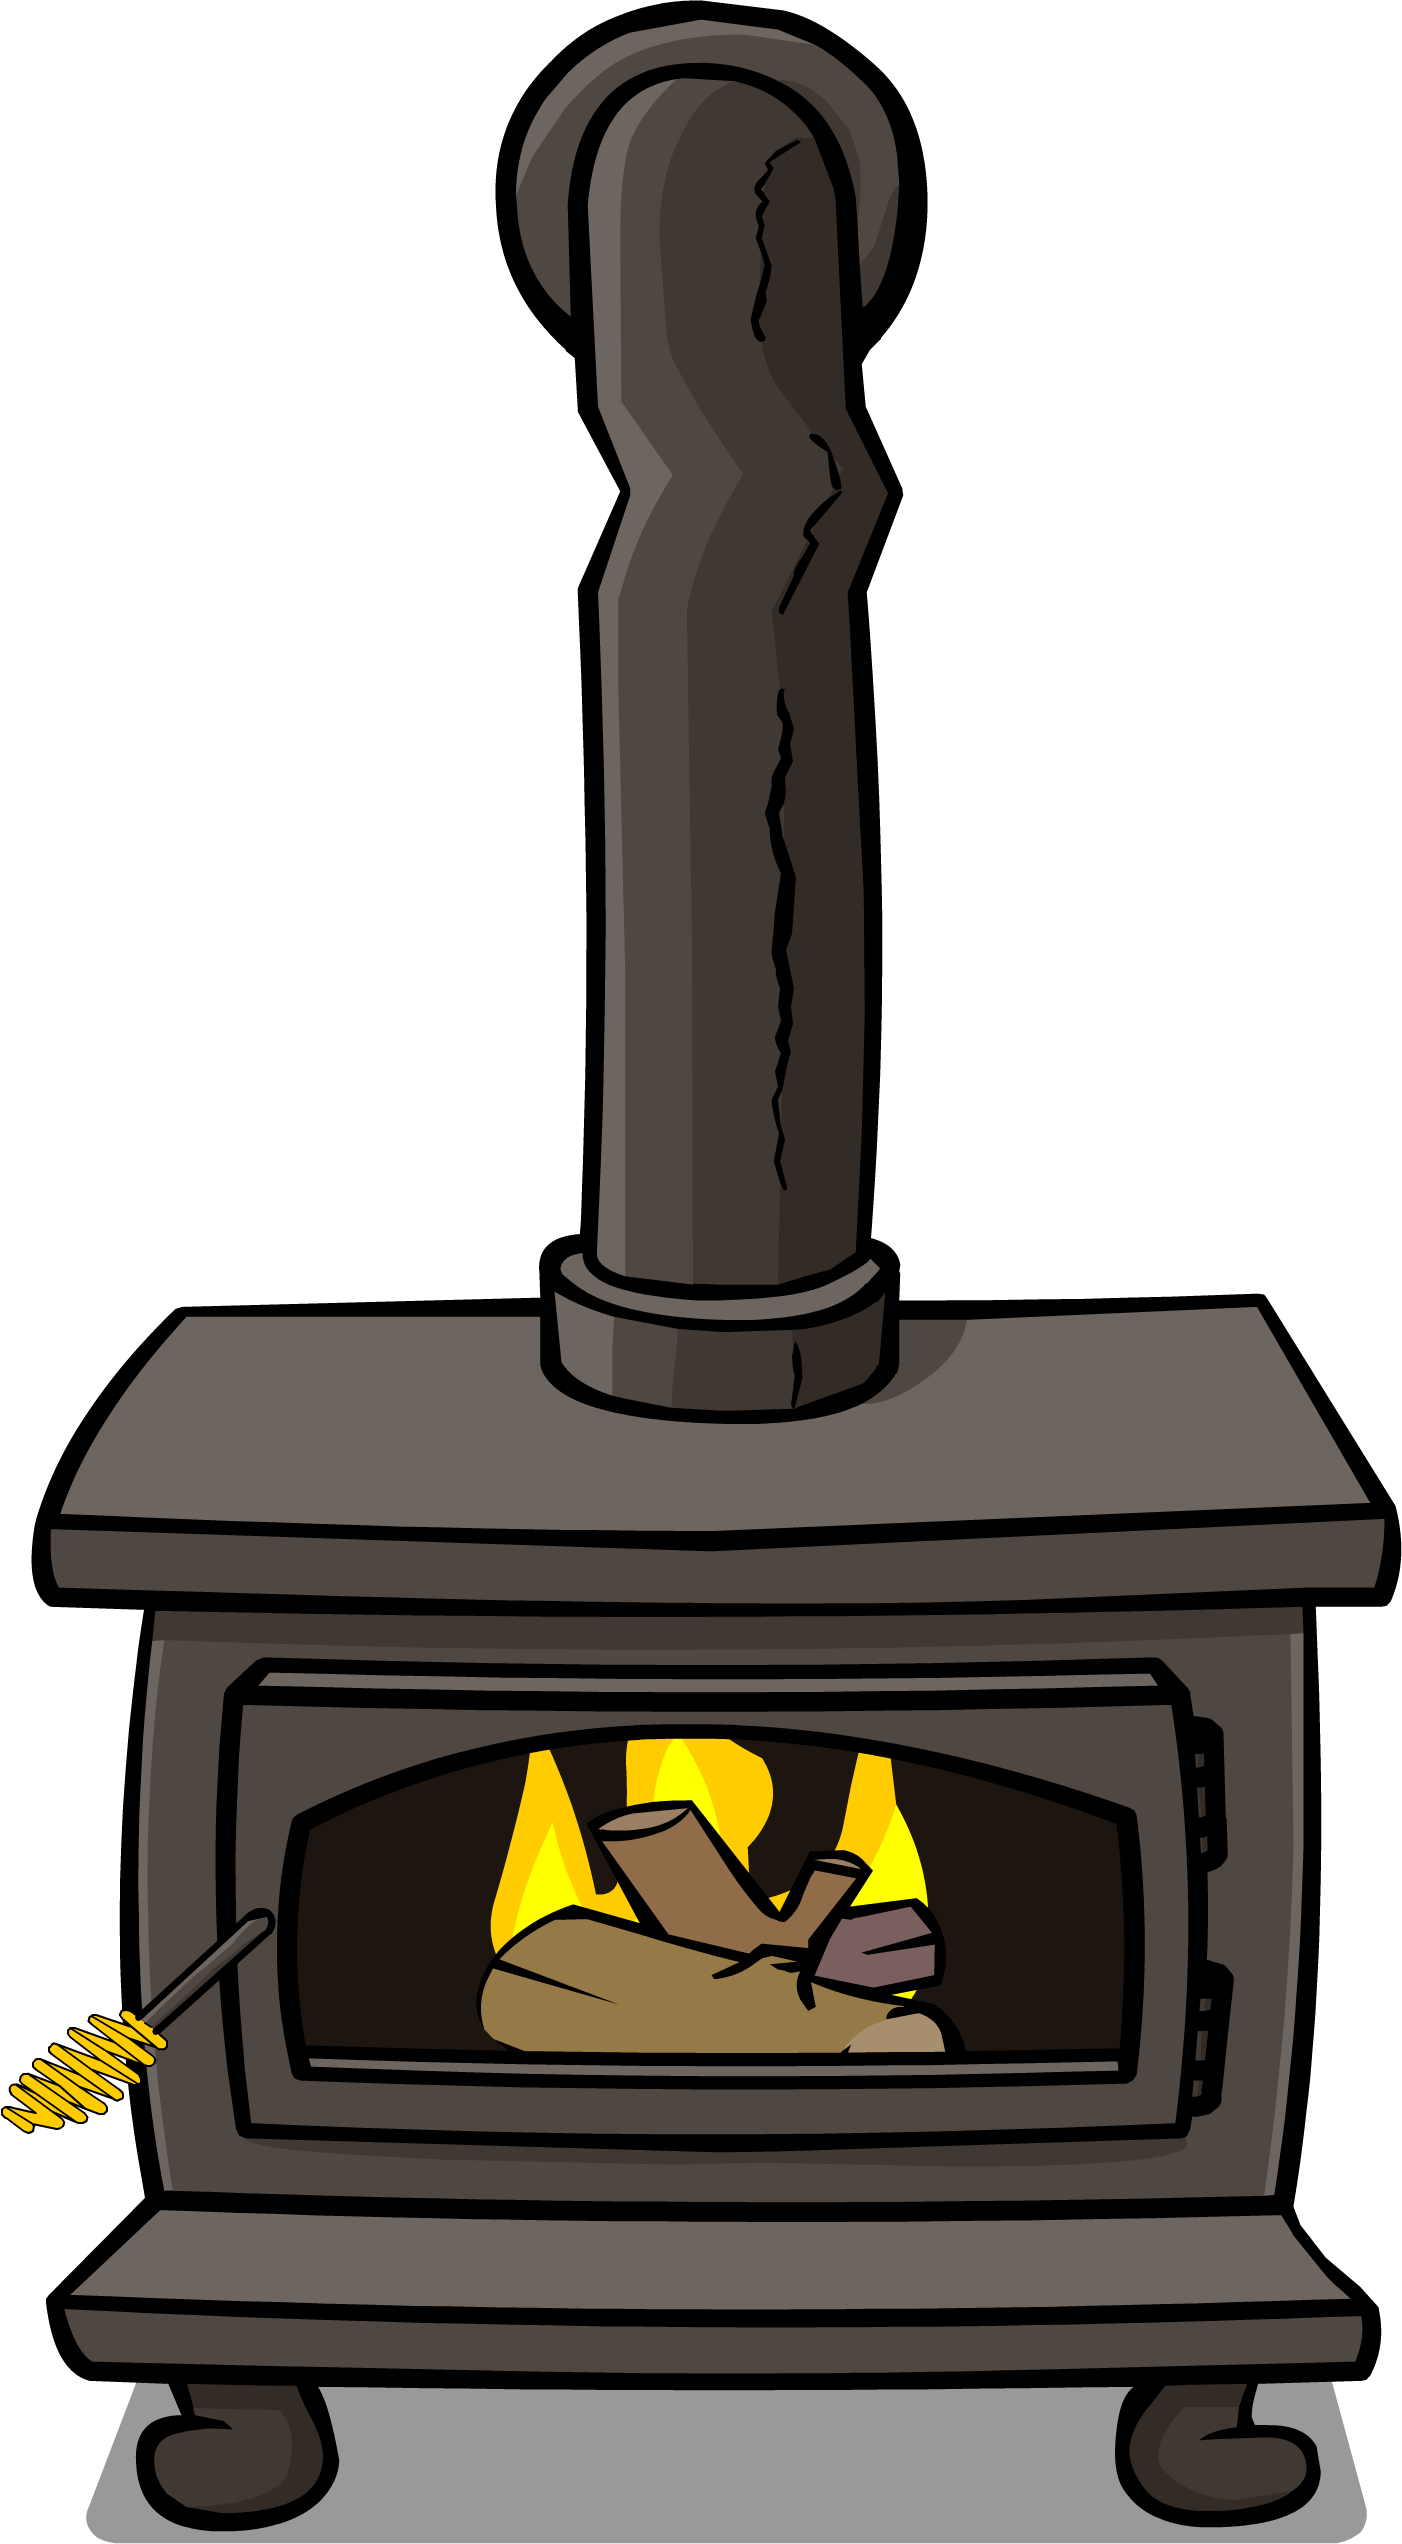 Heat clipart hearth. Image wood stove sprite